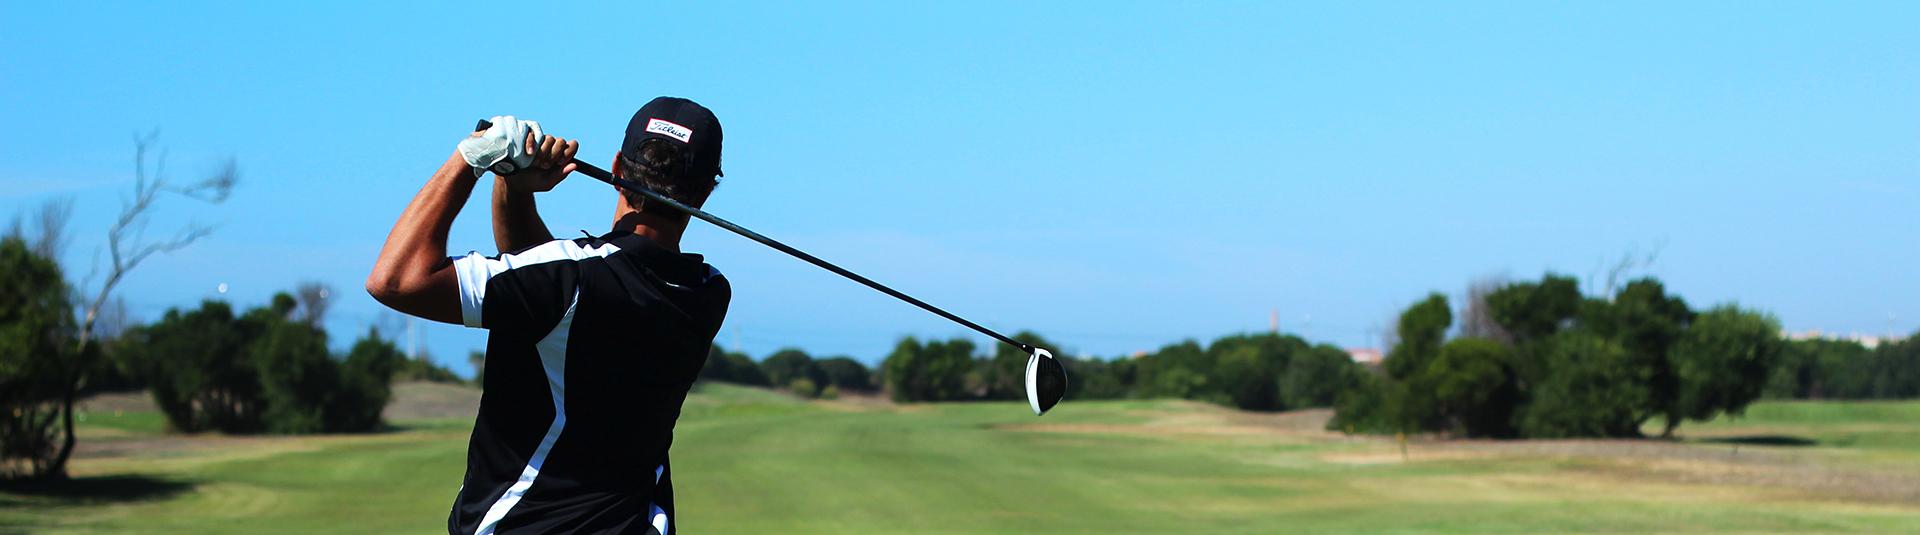 Skeffington CUP - Golf